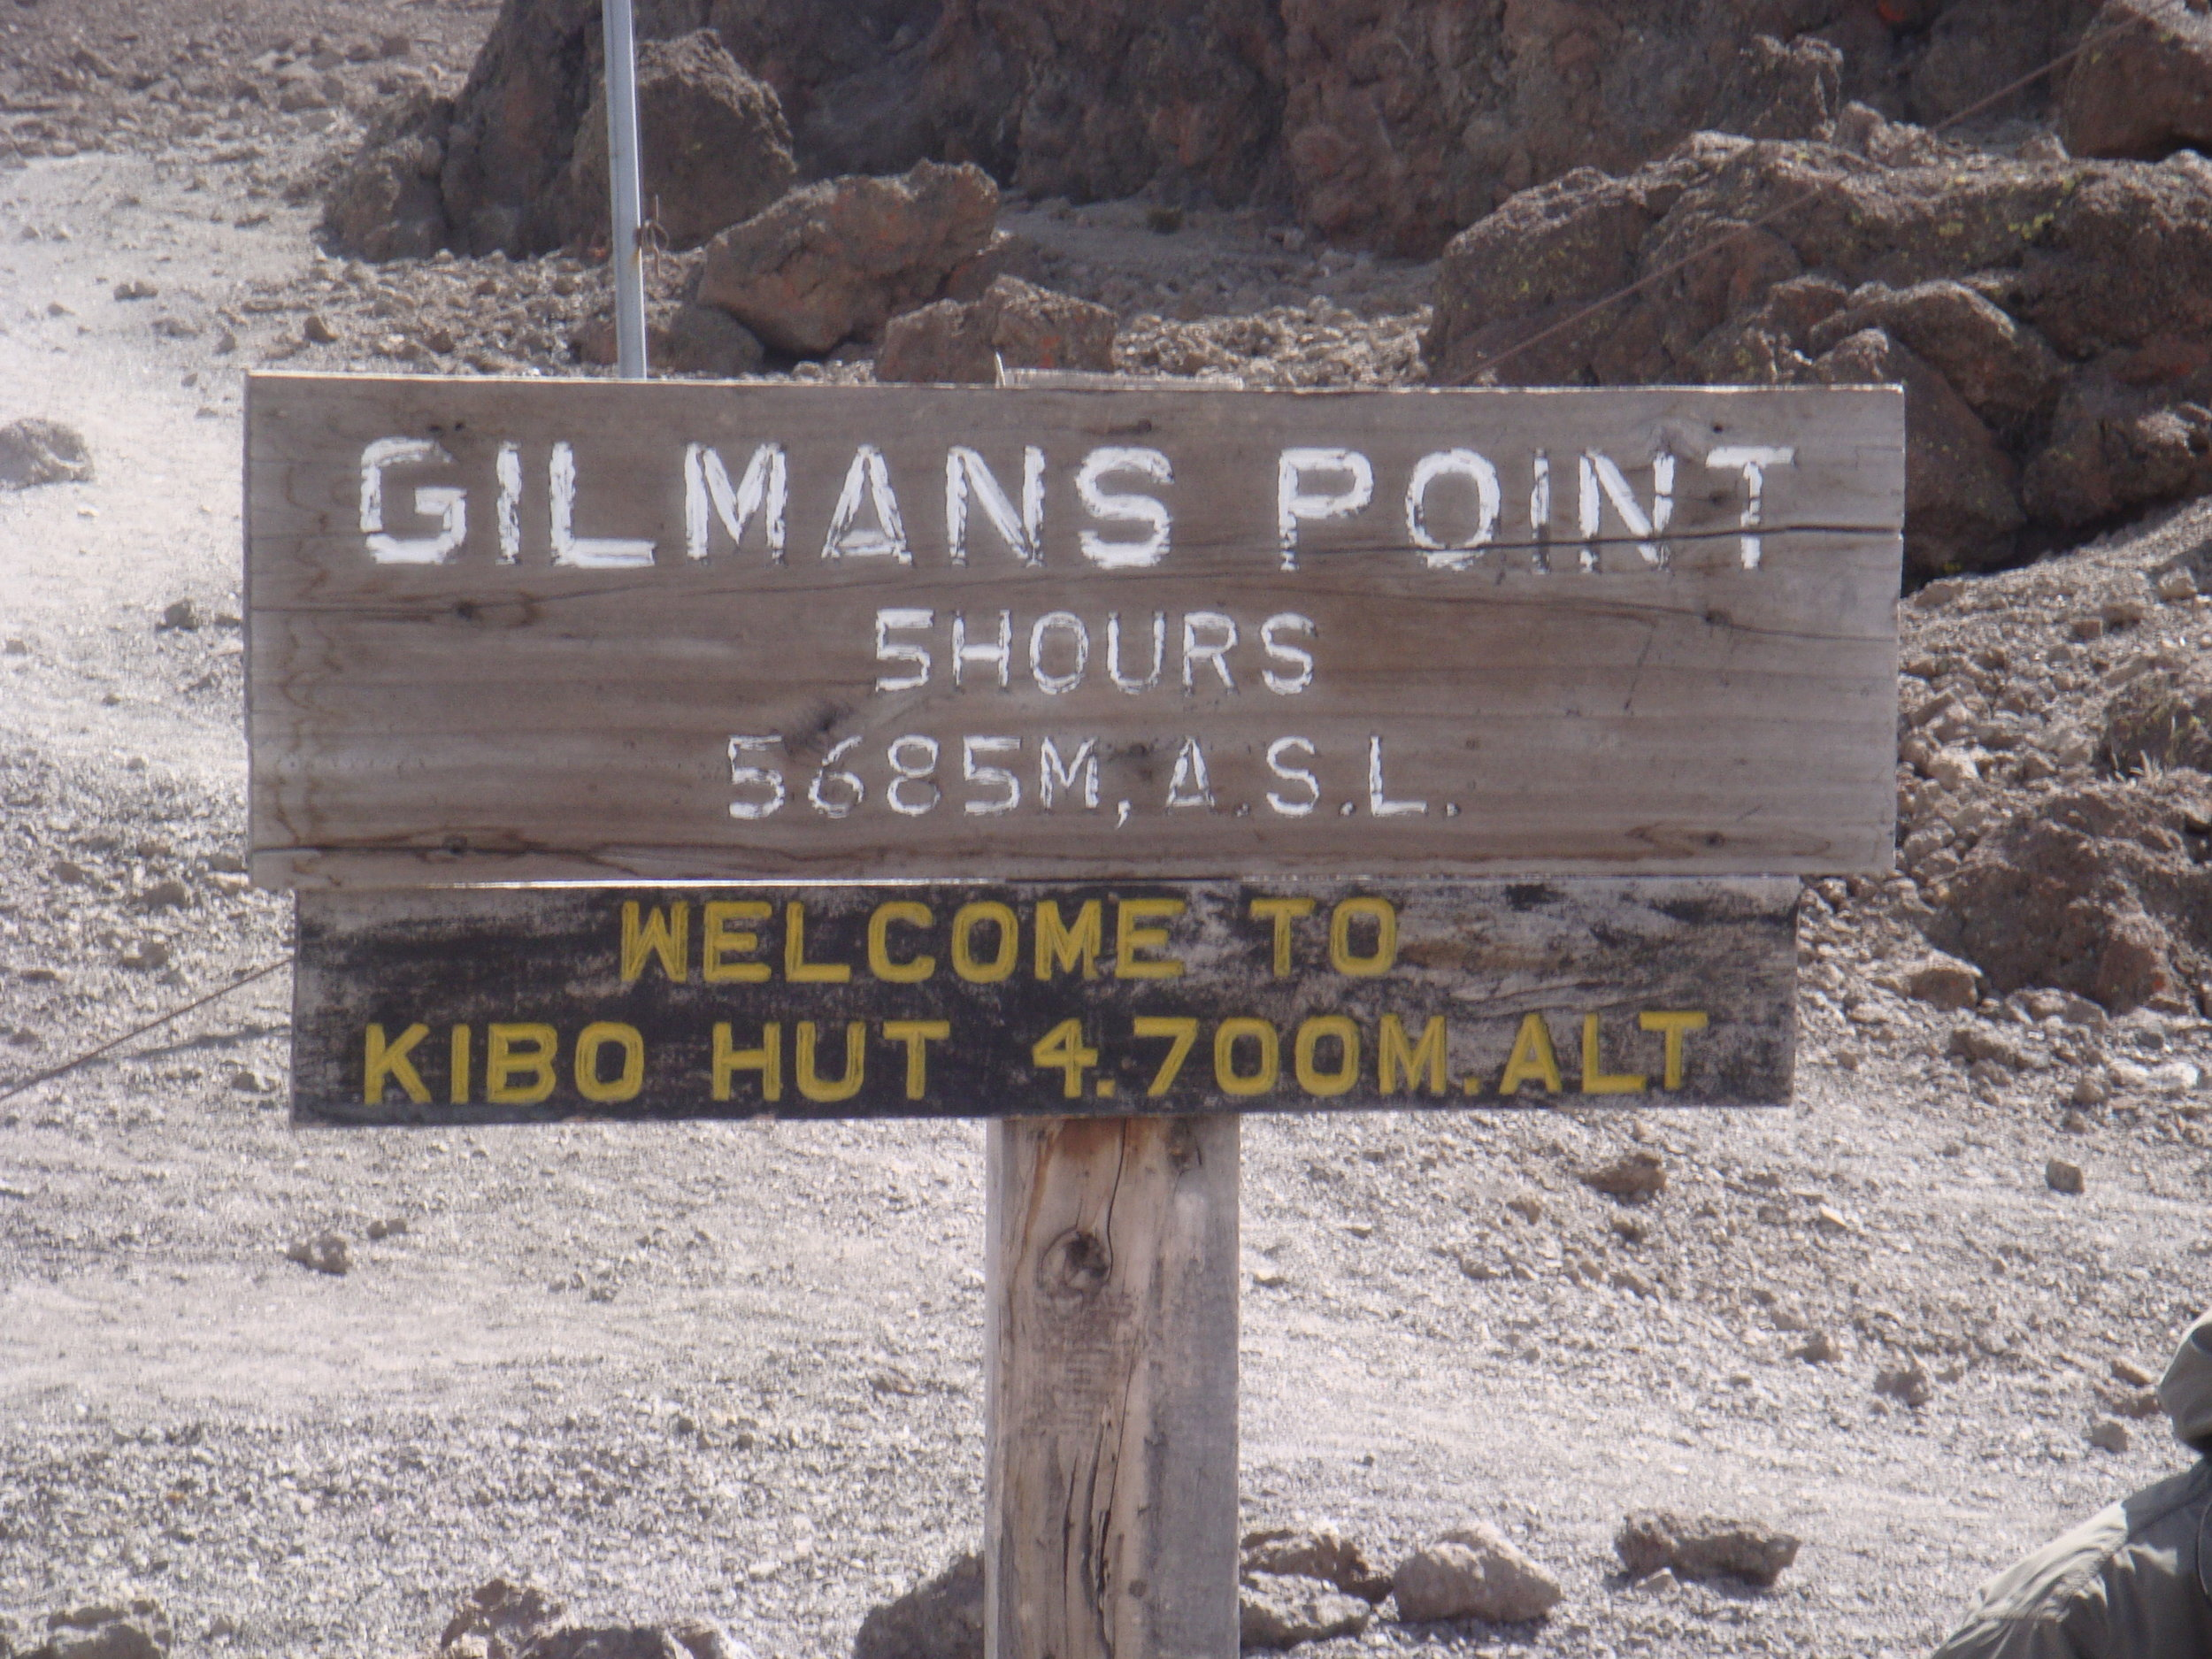 Day 4 hike to Kibo Hut